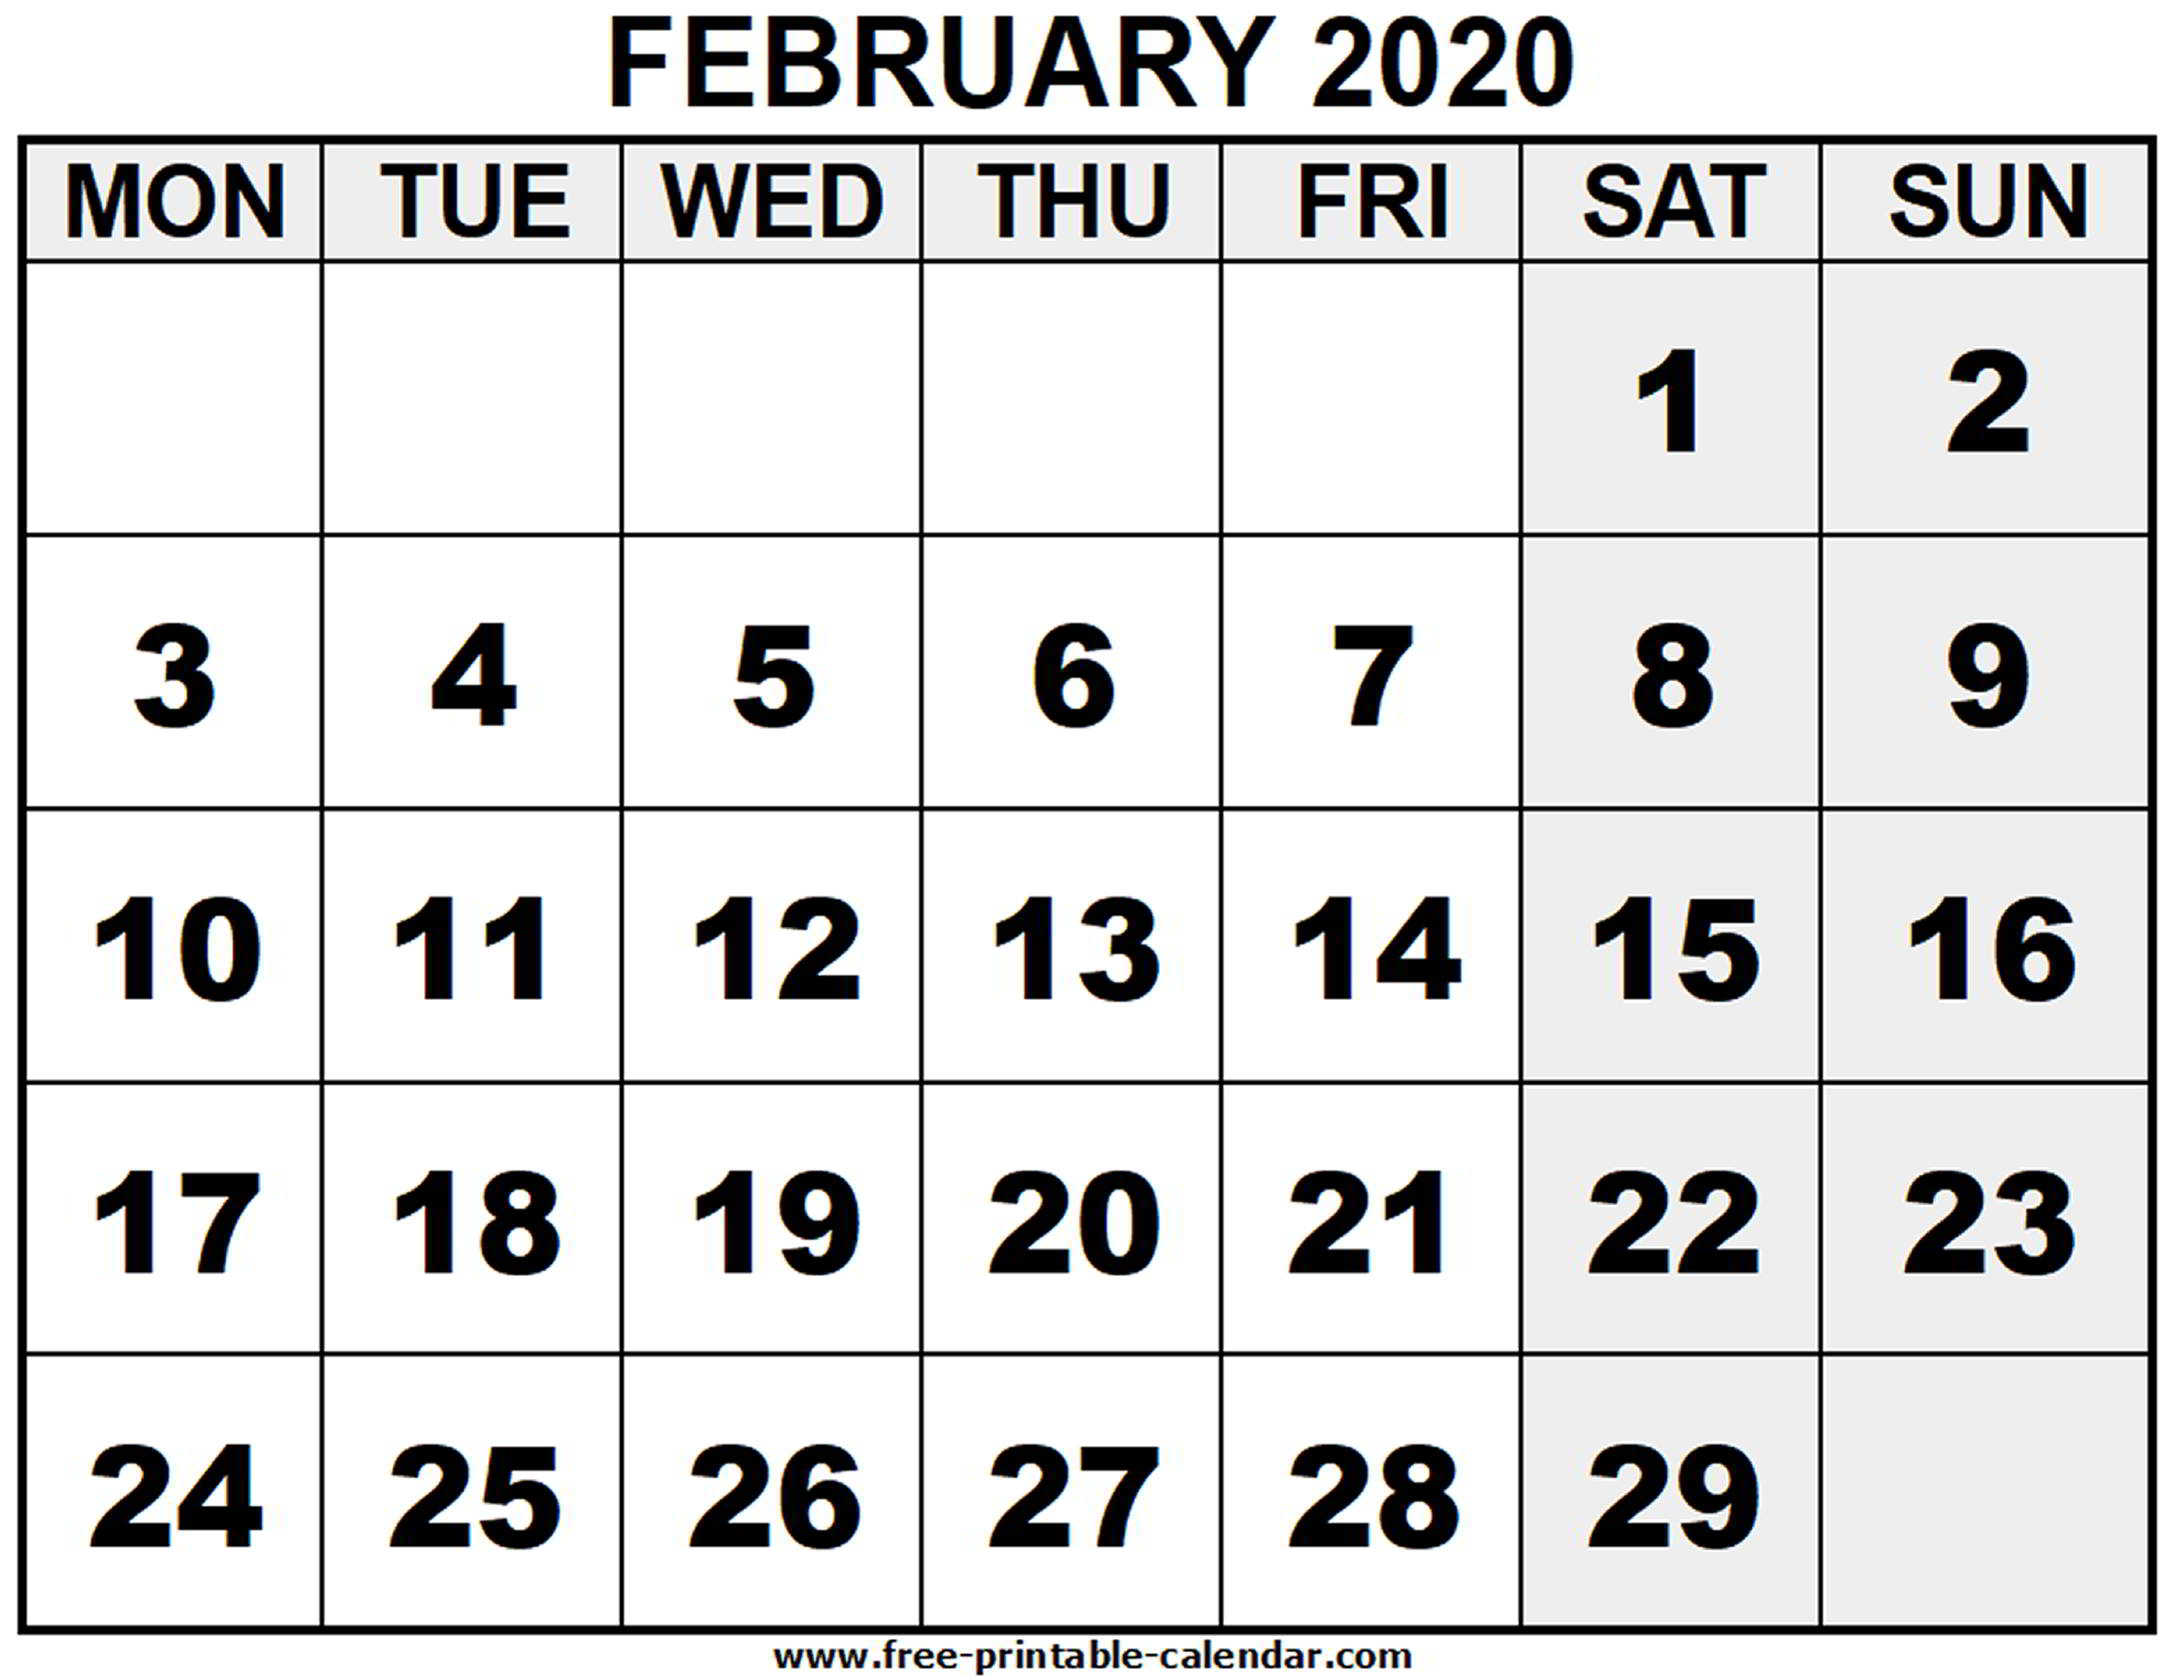 2020 February - Free-Printable-Calendar